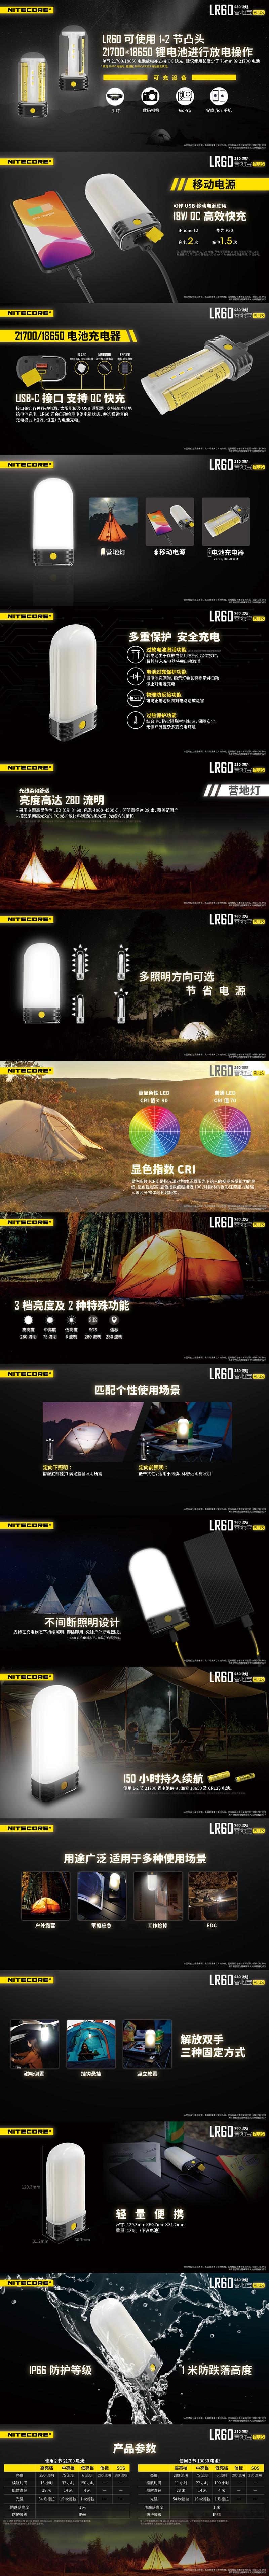 Nitecore台灣總代理【錸特光電】NITECORE  LR60 快充 行動電源 三合一磁吸照明 露營燈 兼容21700及18650電池 USB-C (8)